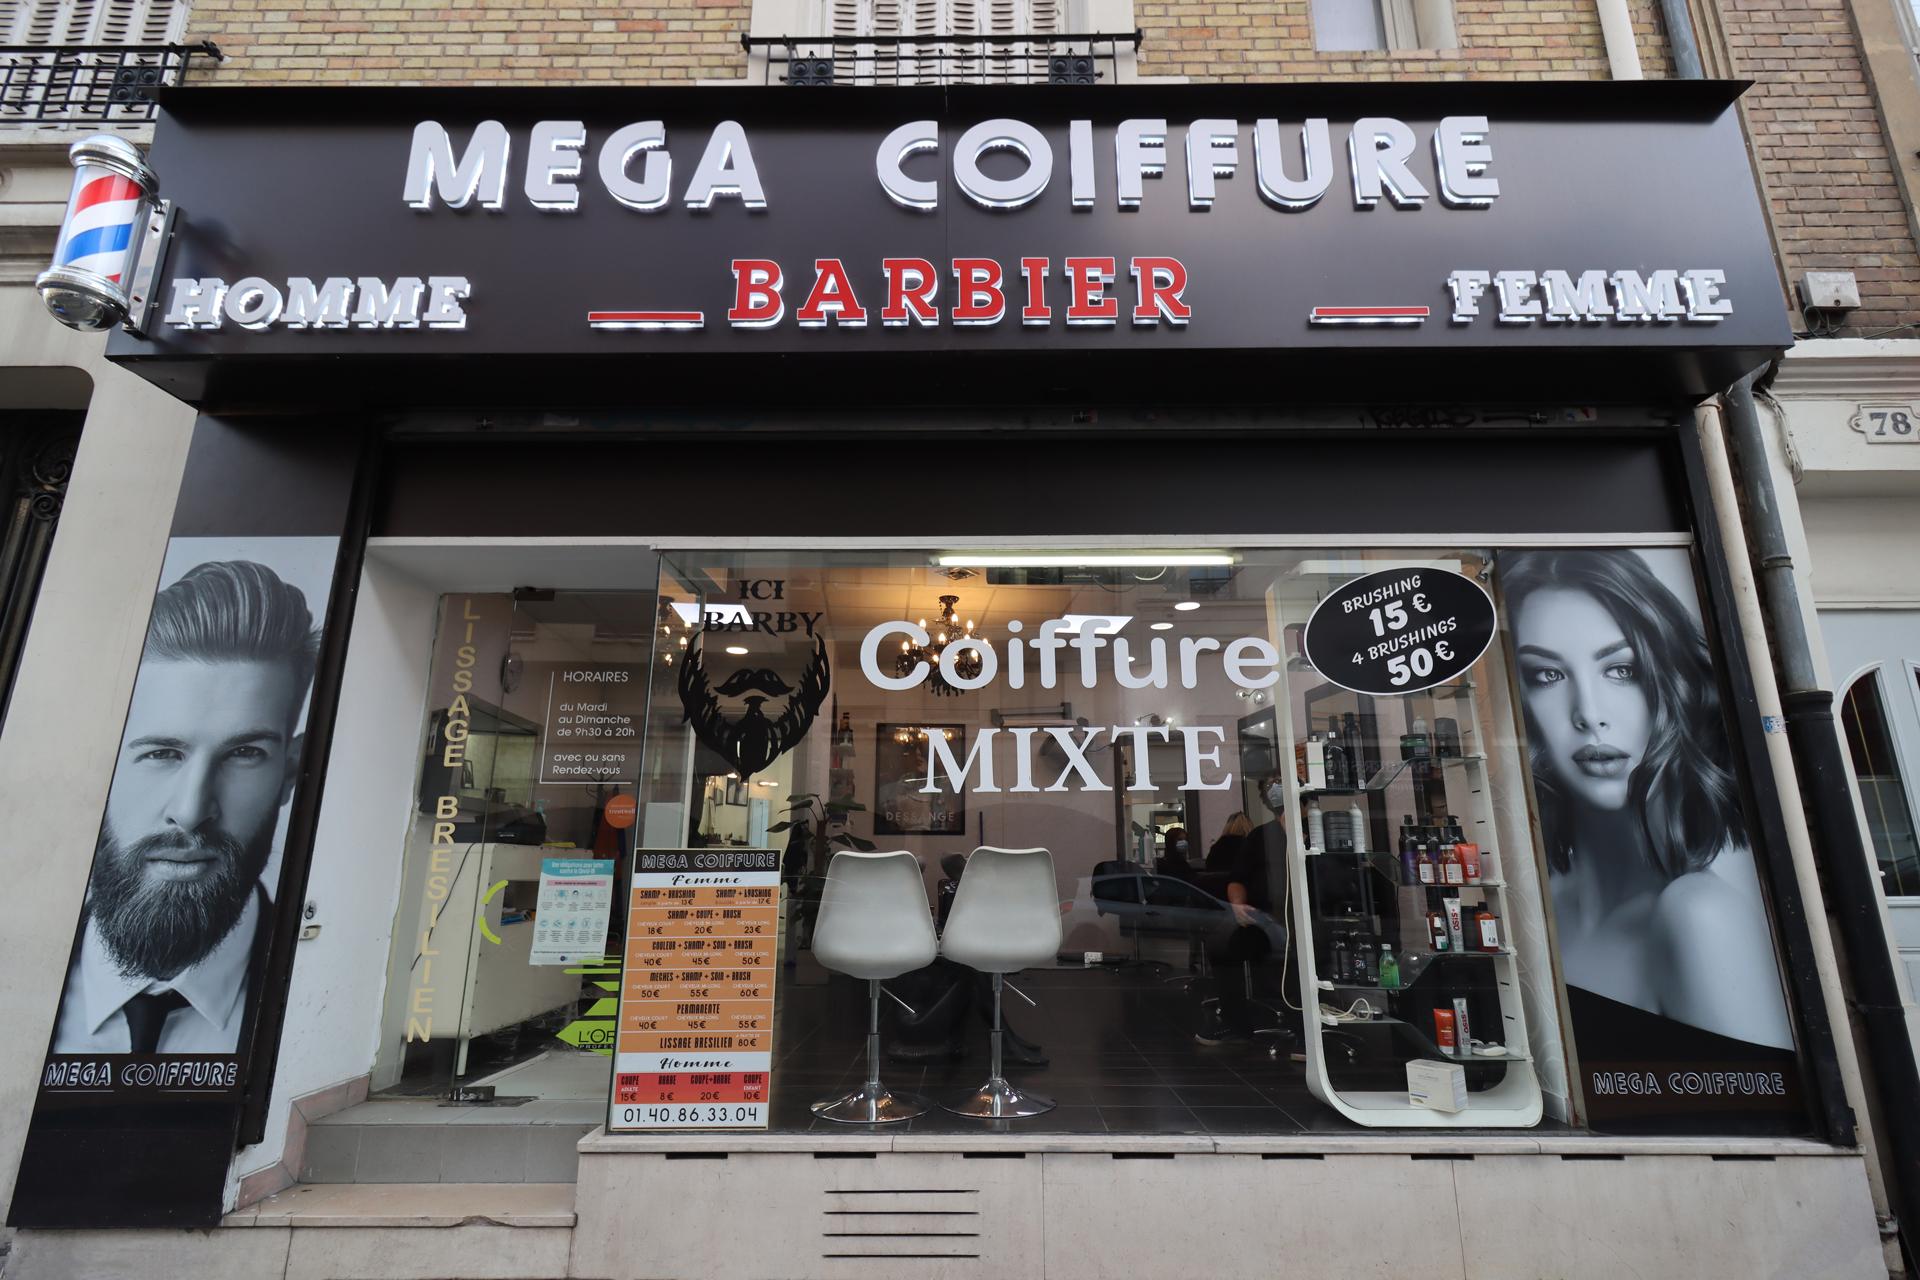 Salon de coiffure Mégacoiffure